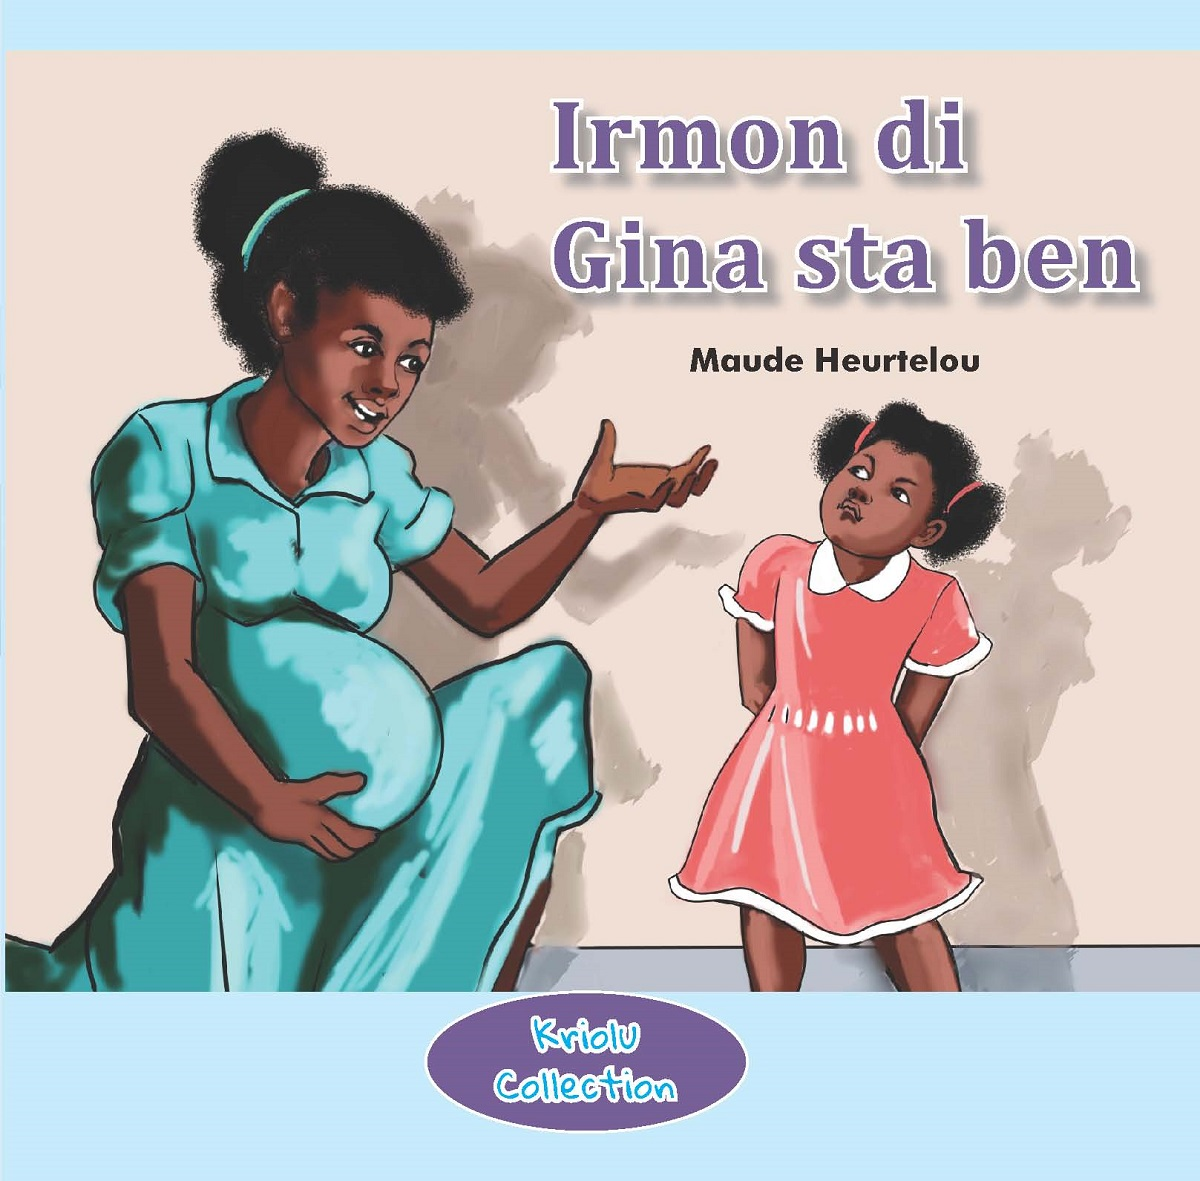 Irmon di Gina sta ben